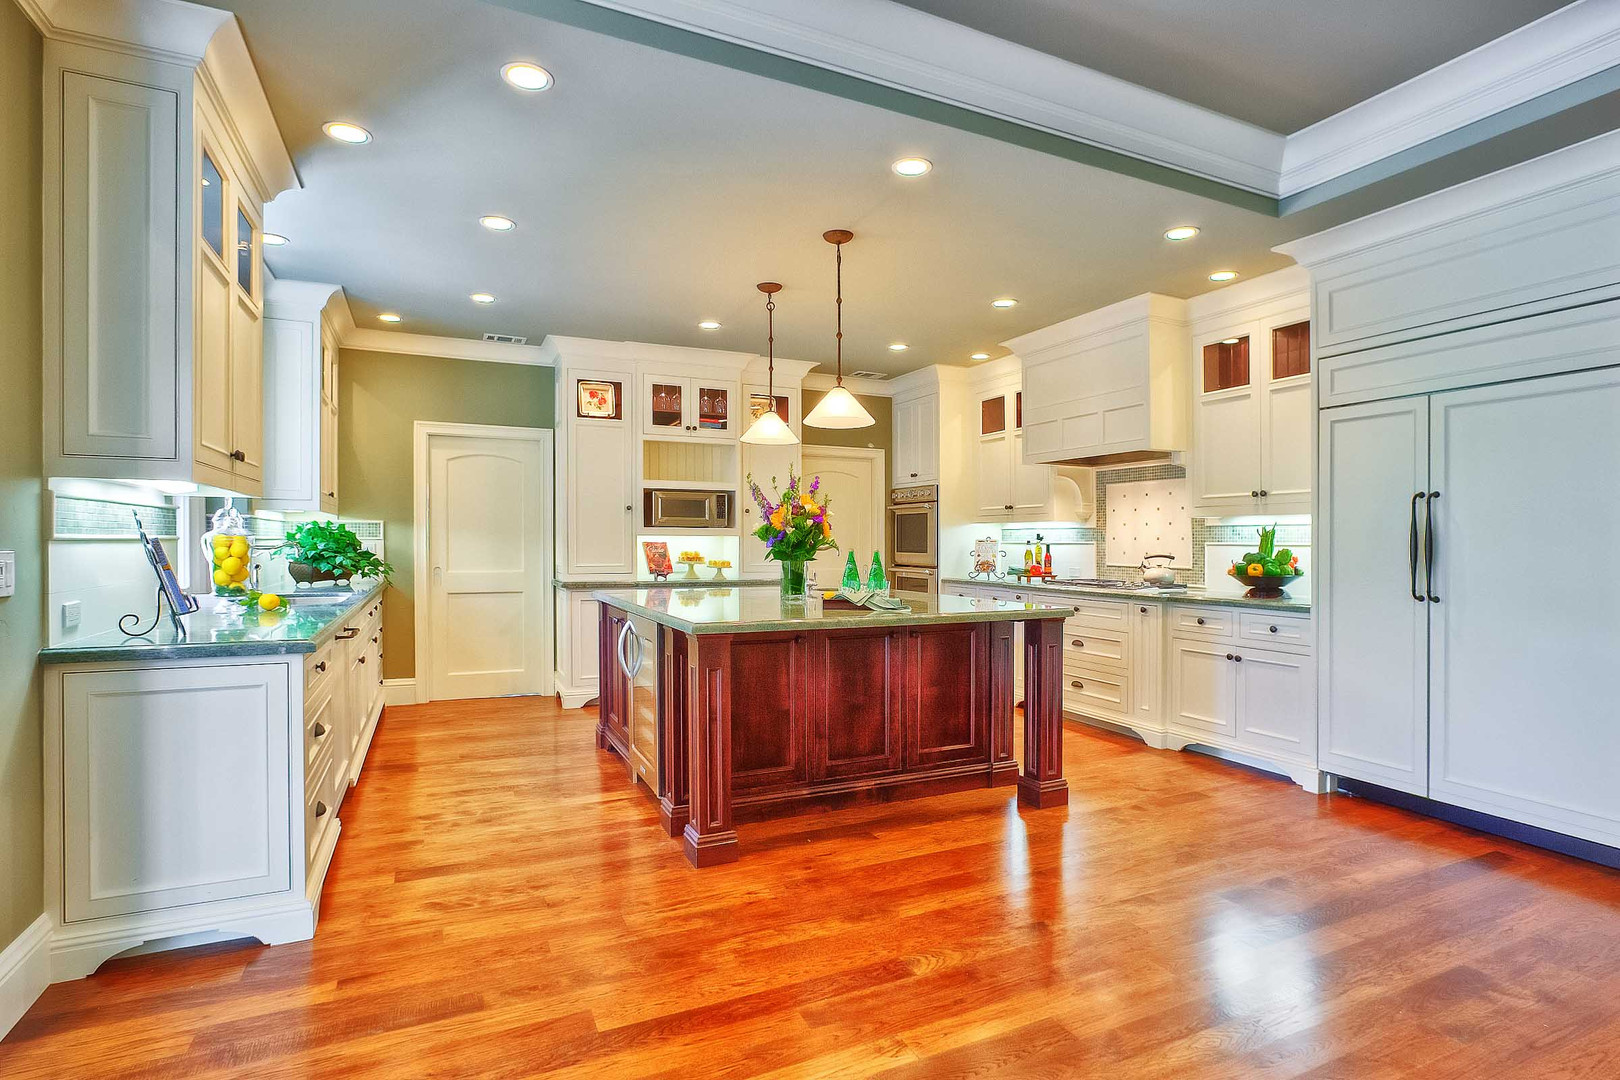 Transitional - East Creek - Kitchen - 2